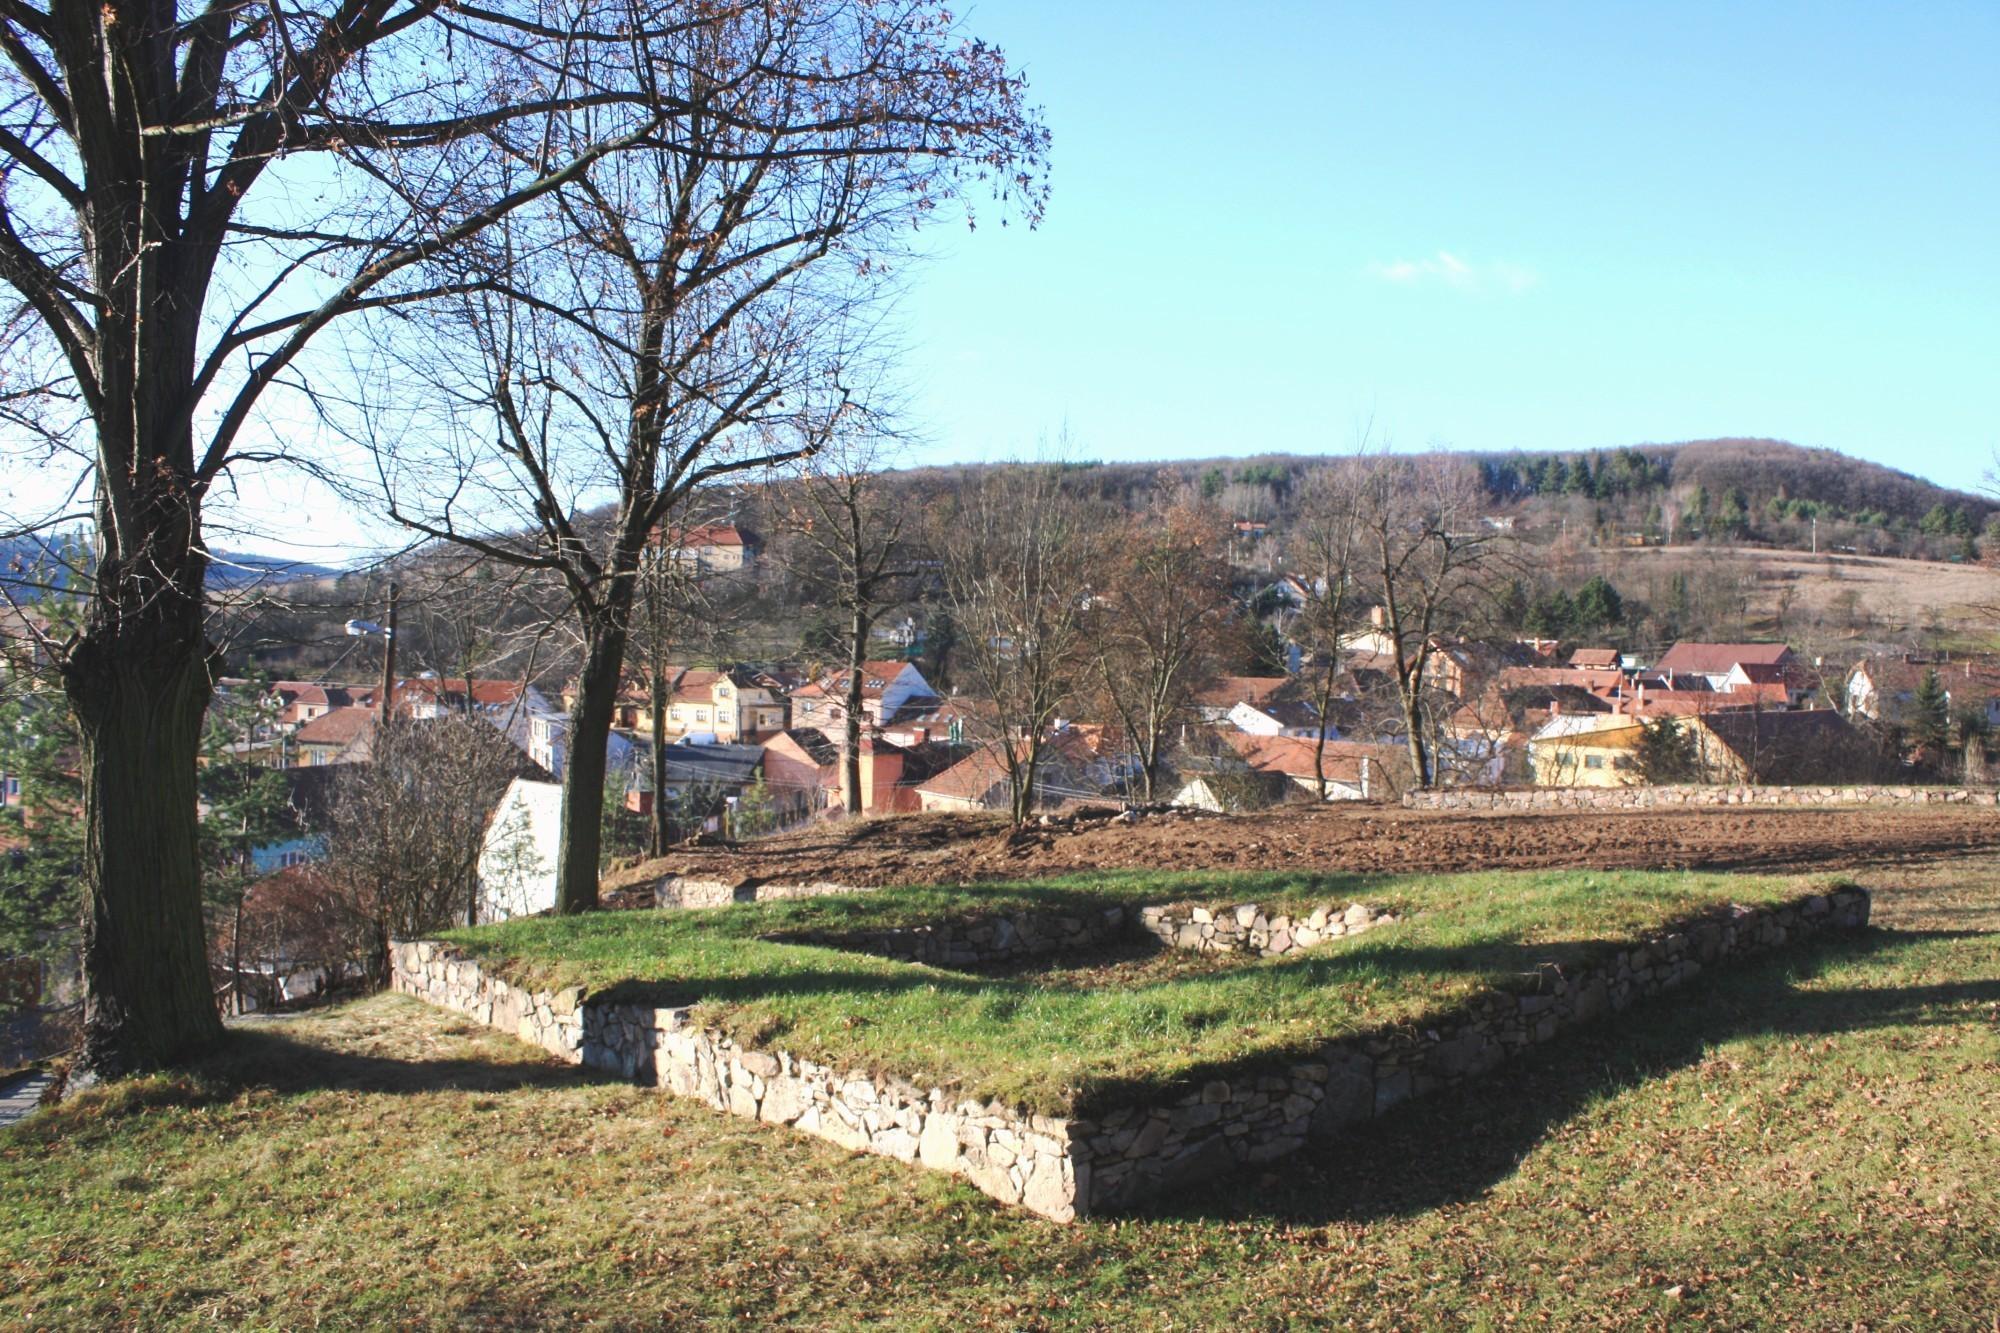 Mstsk ad Kuim - Obec Lelekovice